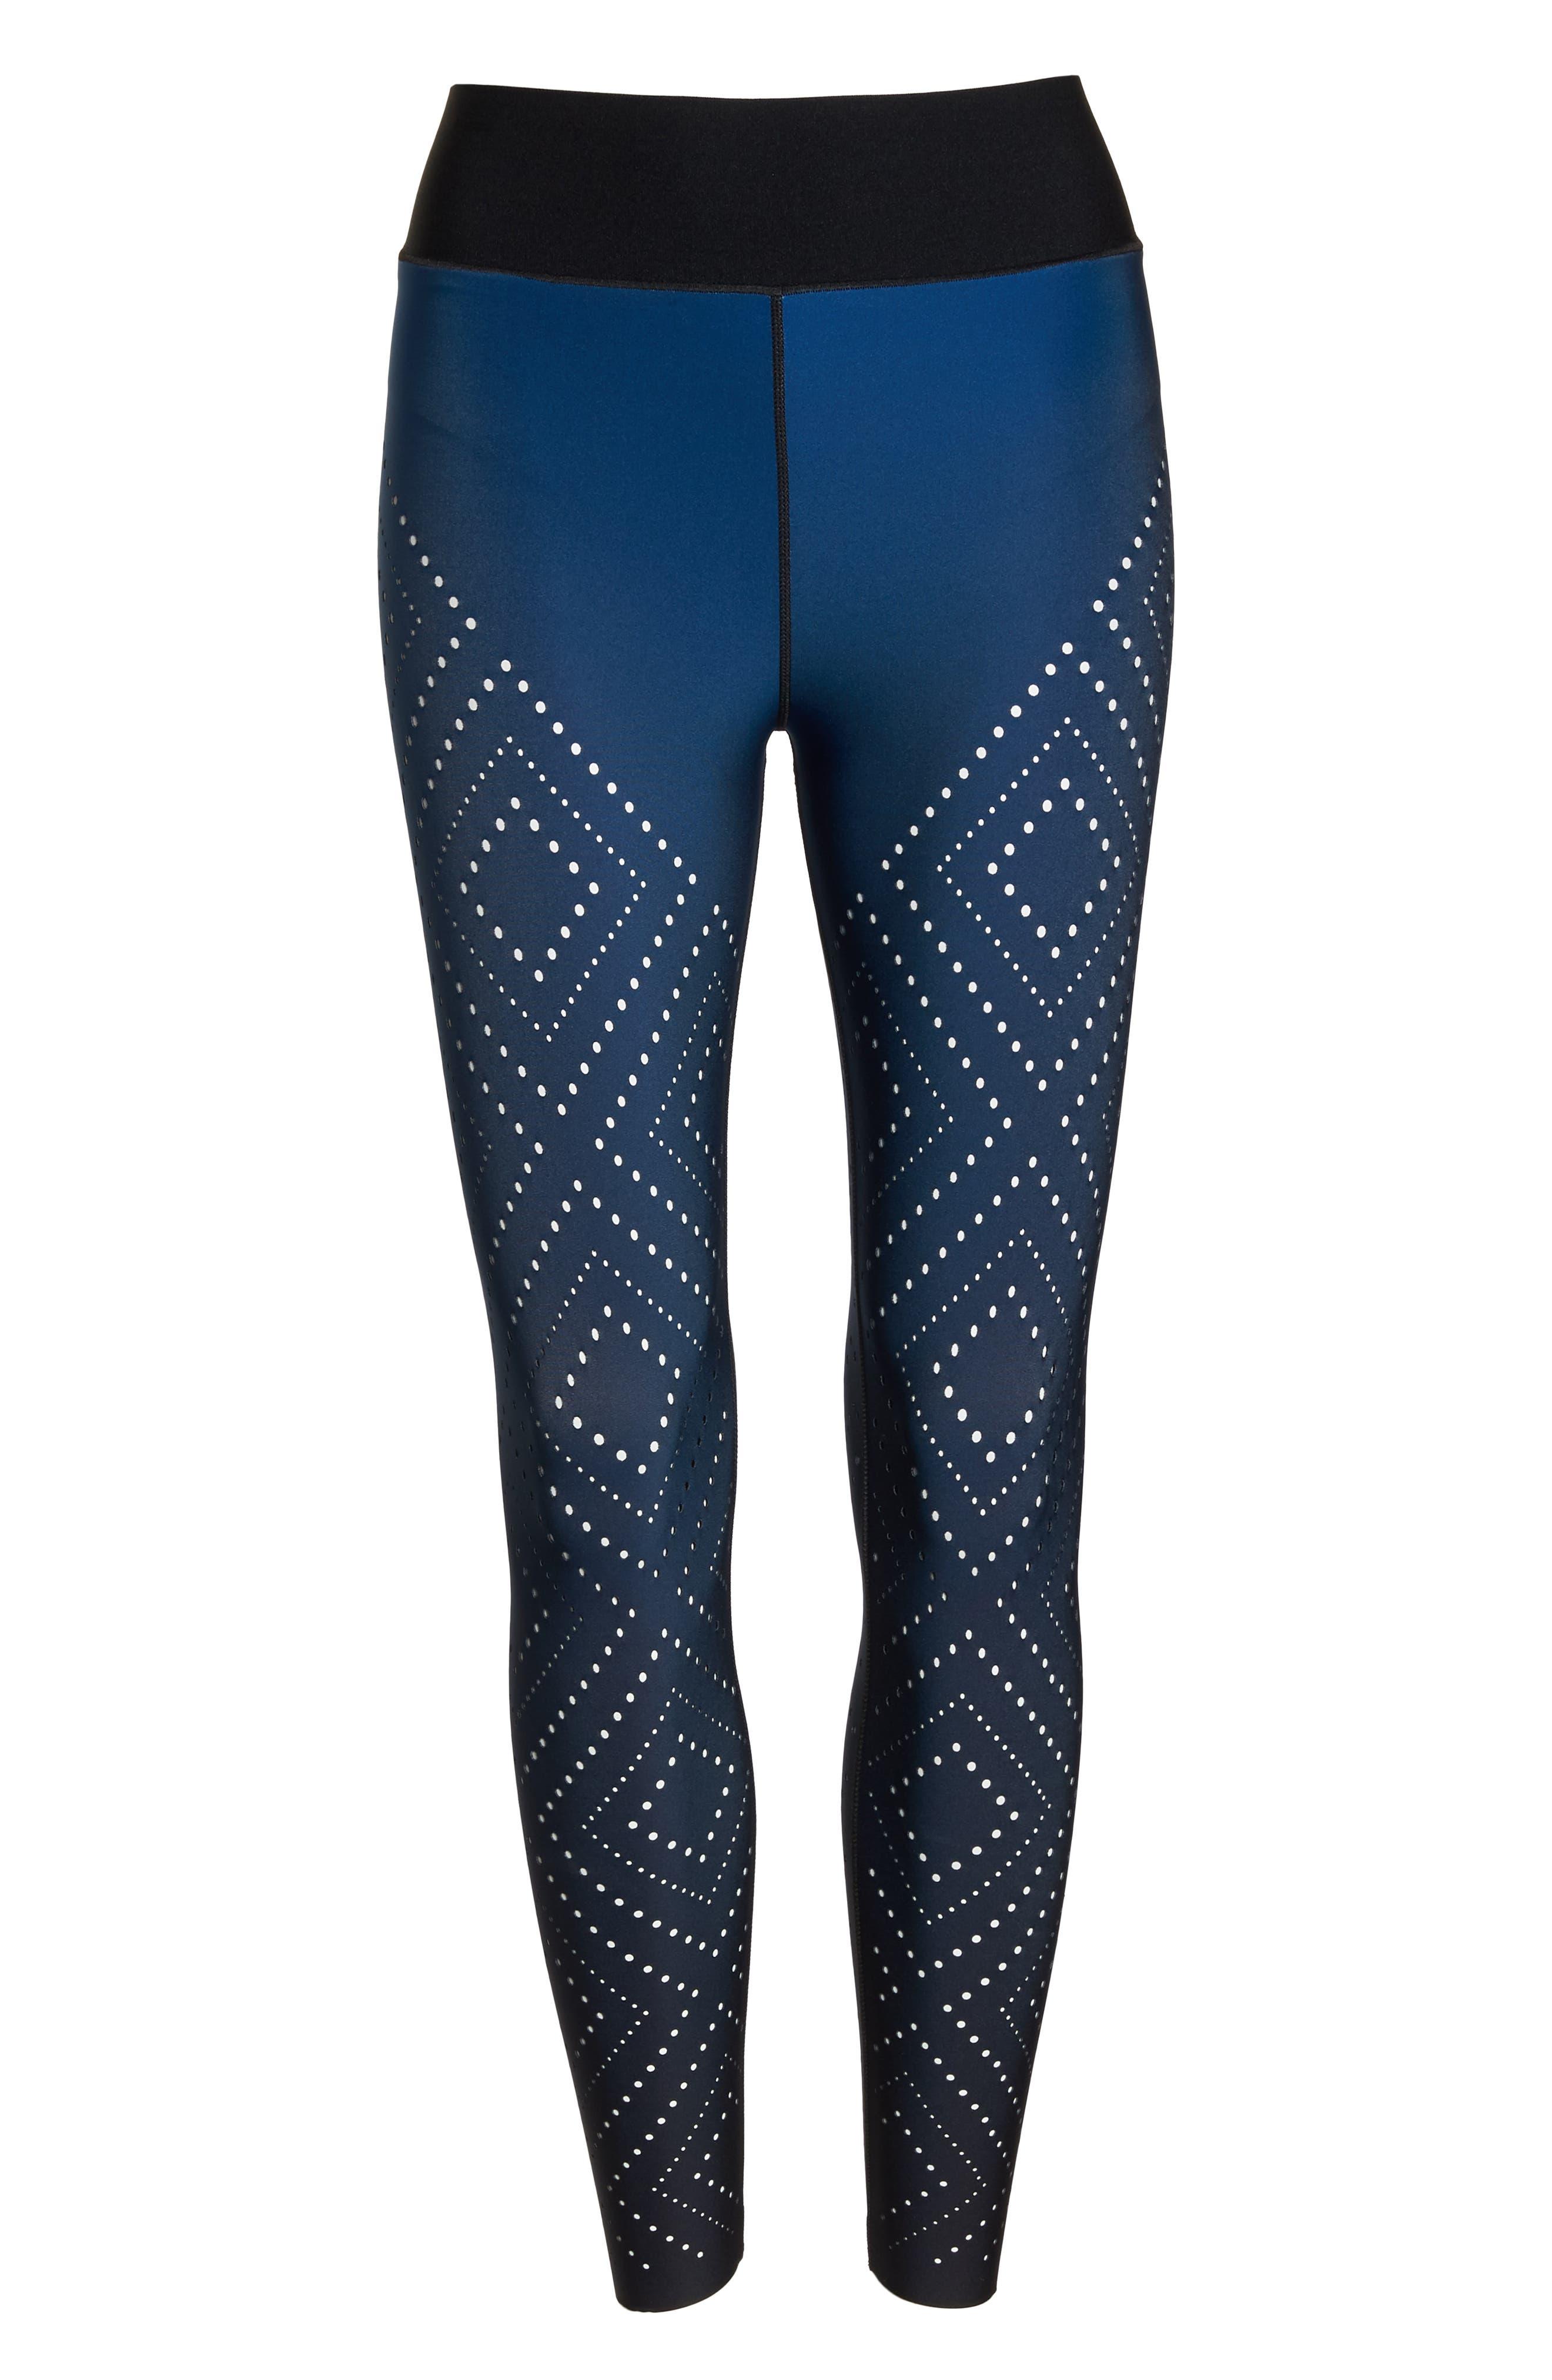 Sprinter High Argyle Pixelate Leggings,                             Alternate thumbnail 7, color,                             GRADIENT SAPPHIRE